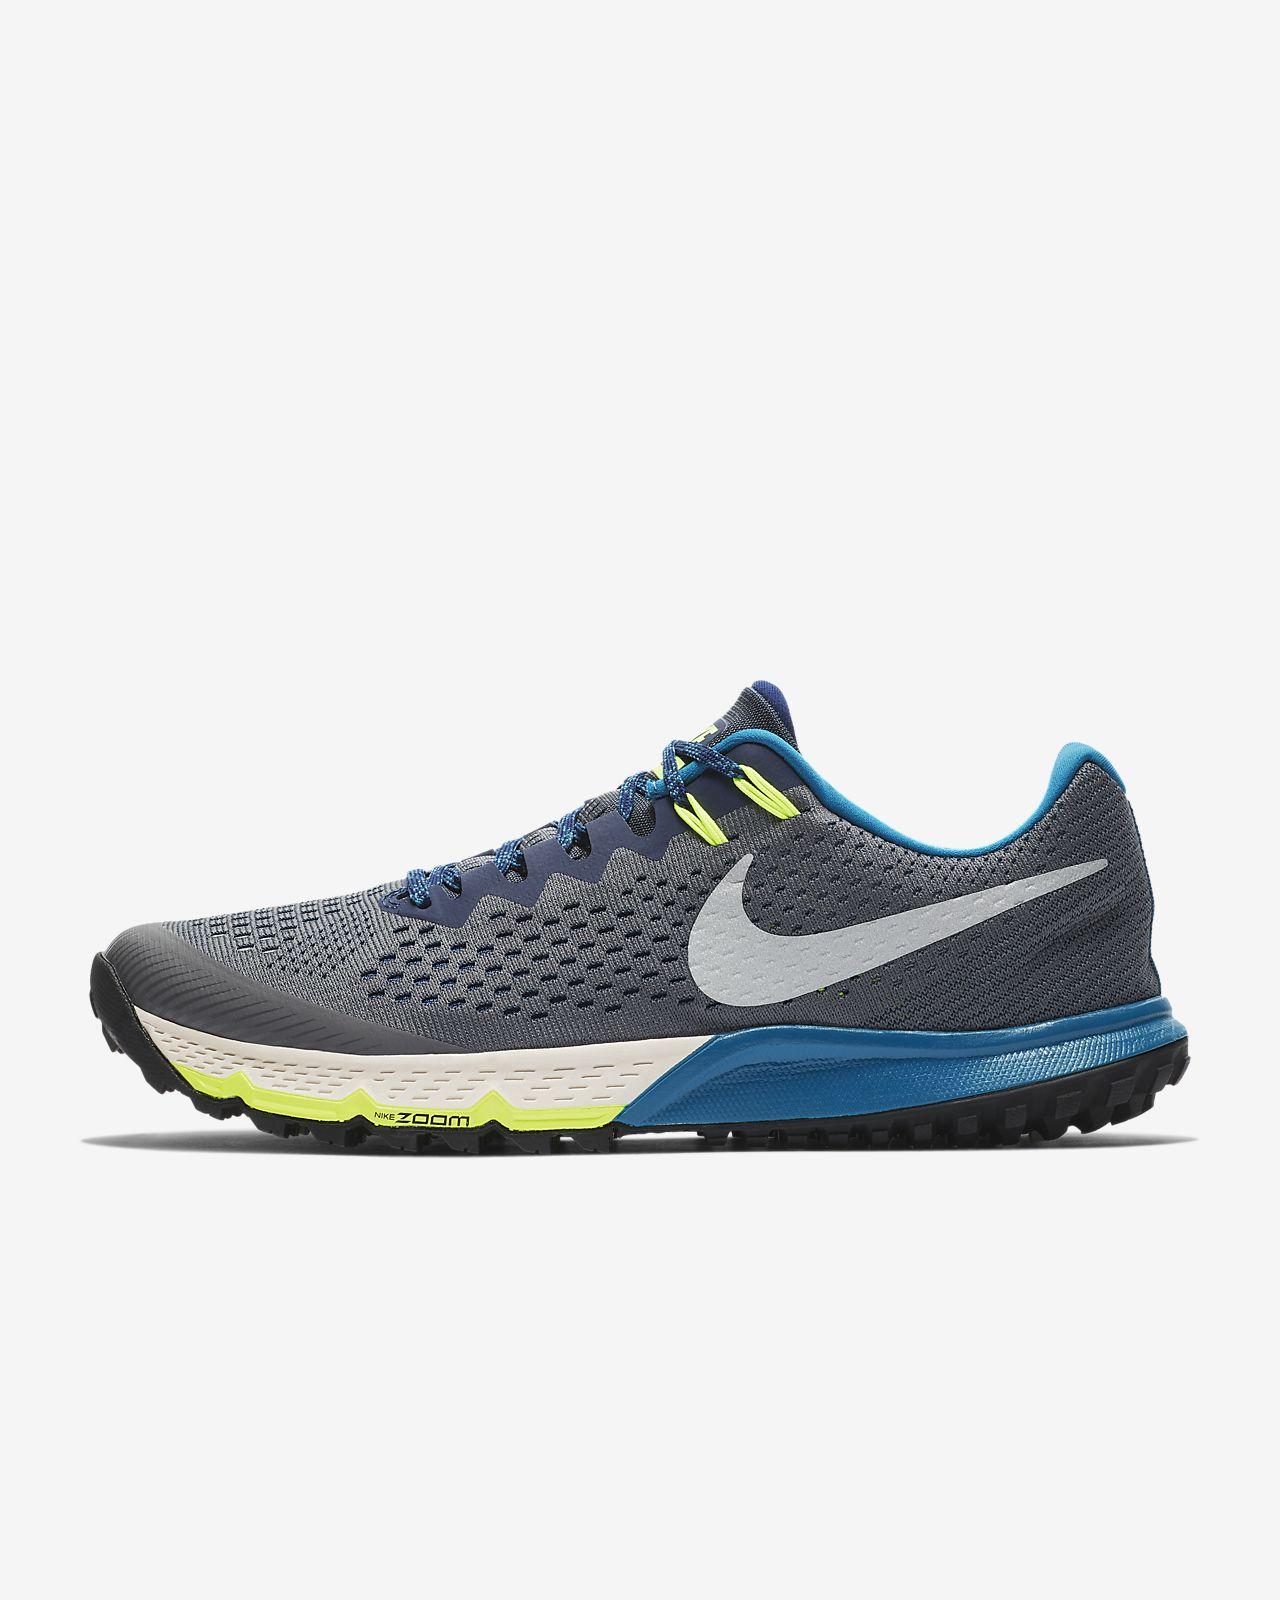 online store 3dcc5 396ee ... Löparsko Nike Air Zoom Terra Kiger 4 för män